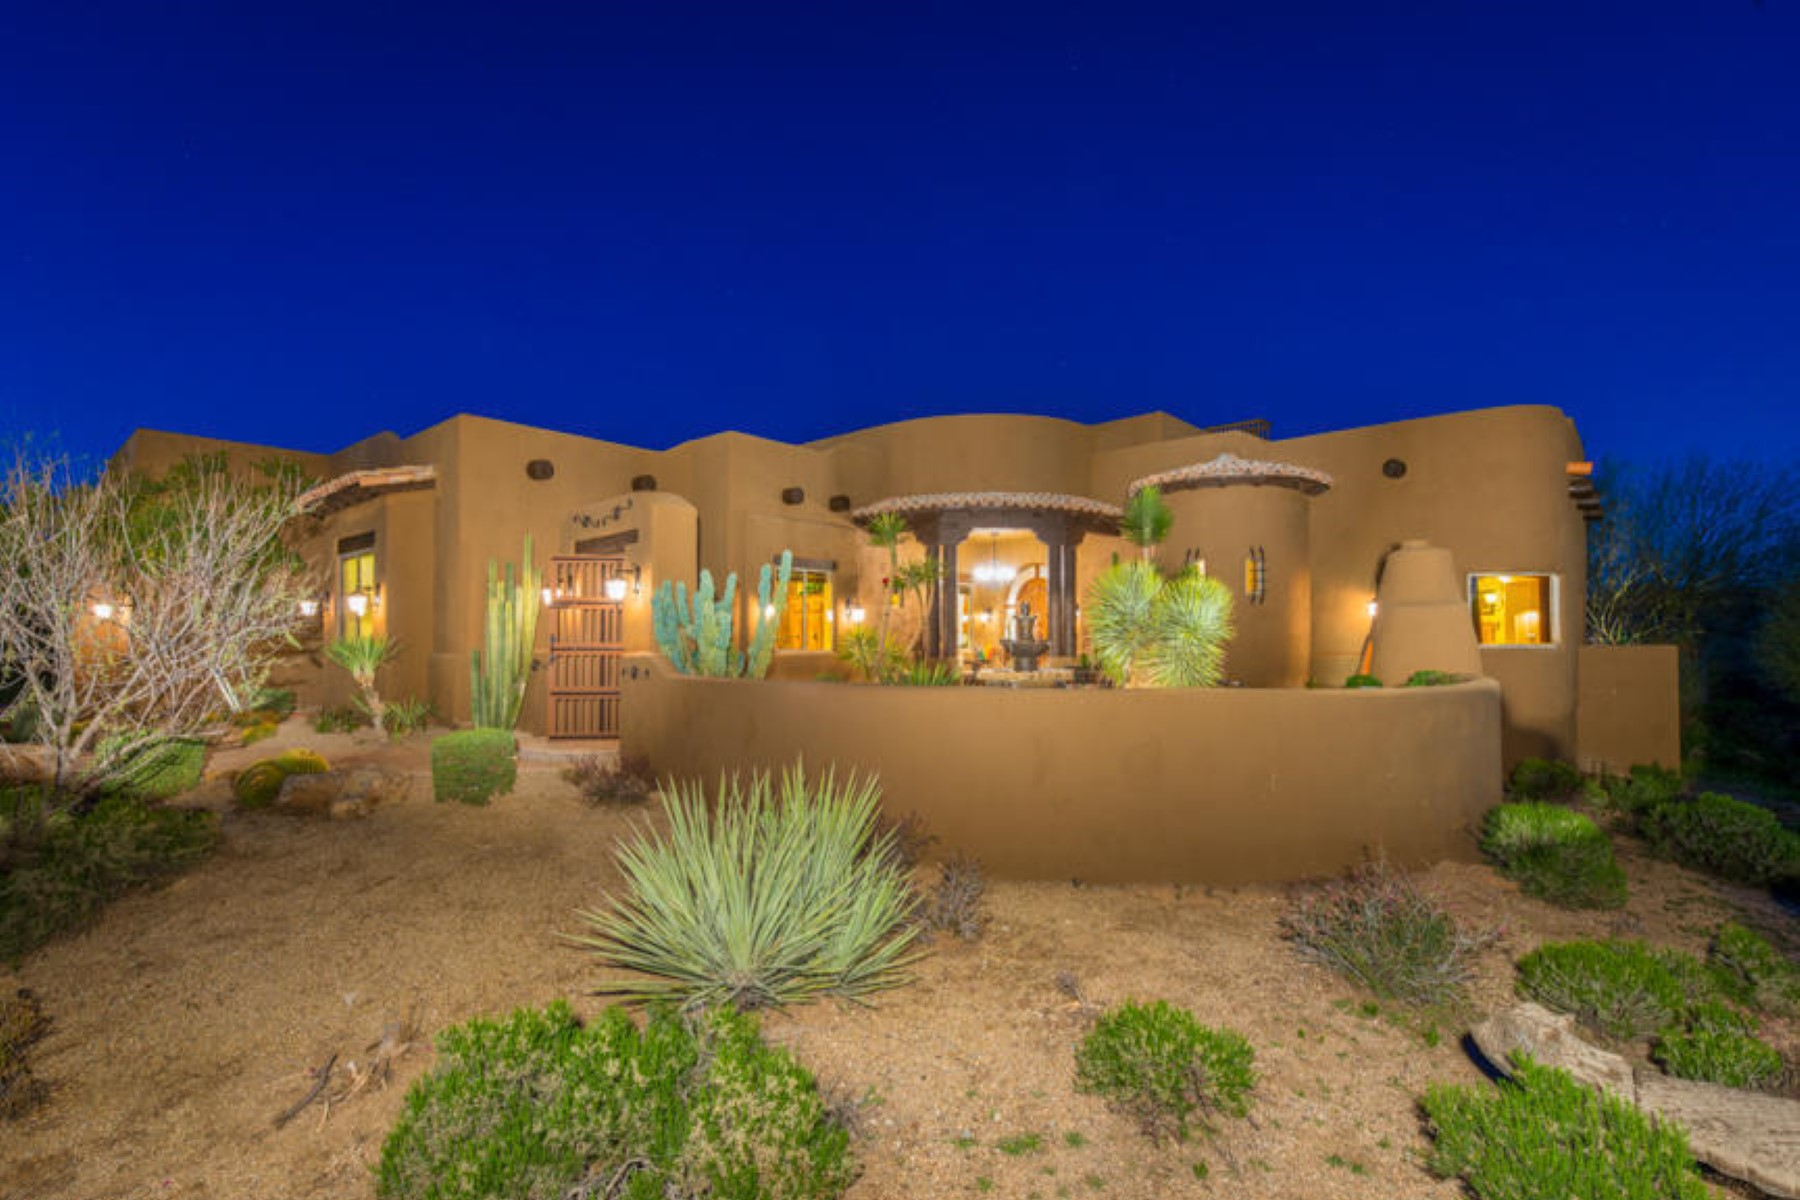 Casa Unifamiliar por un Venta en Stunning Custom Home On 1.27 Acres With Beautiful Mountain, City & Desert Views 37935 N Boulder View Drive Scottsdale, Arizona 85262 Estados Unidos